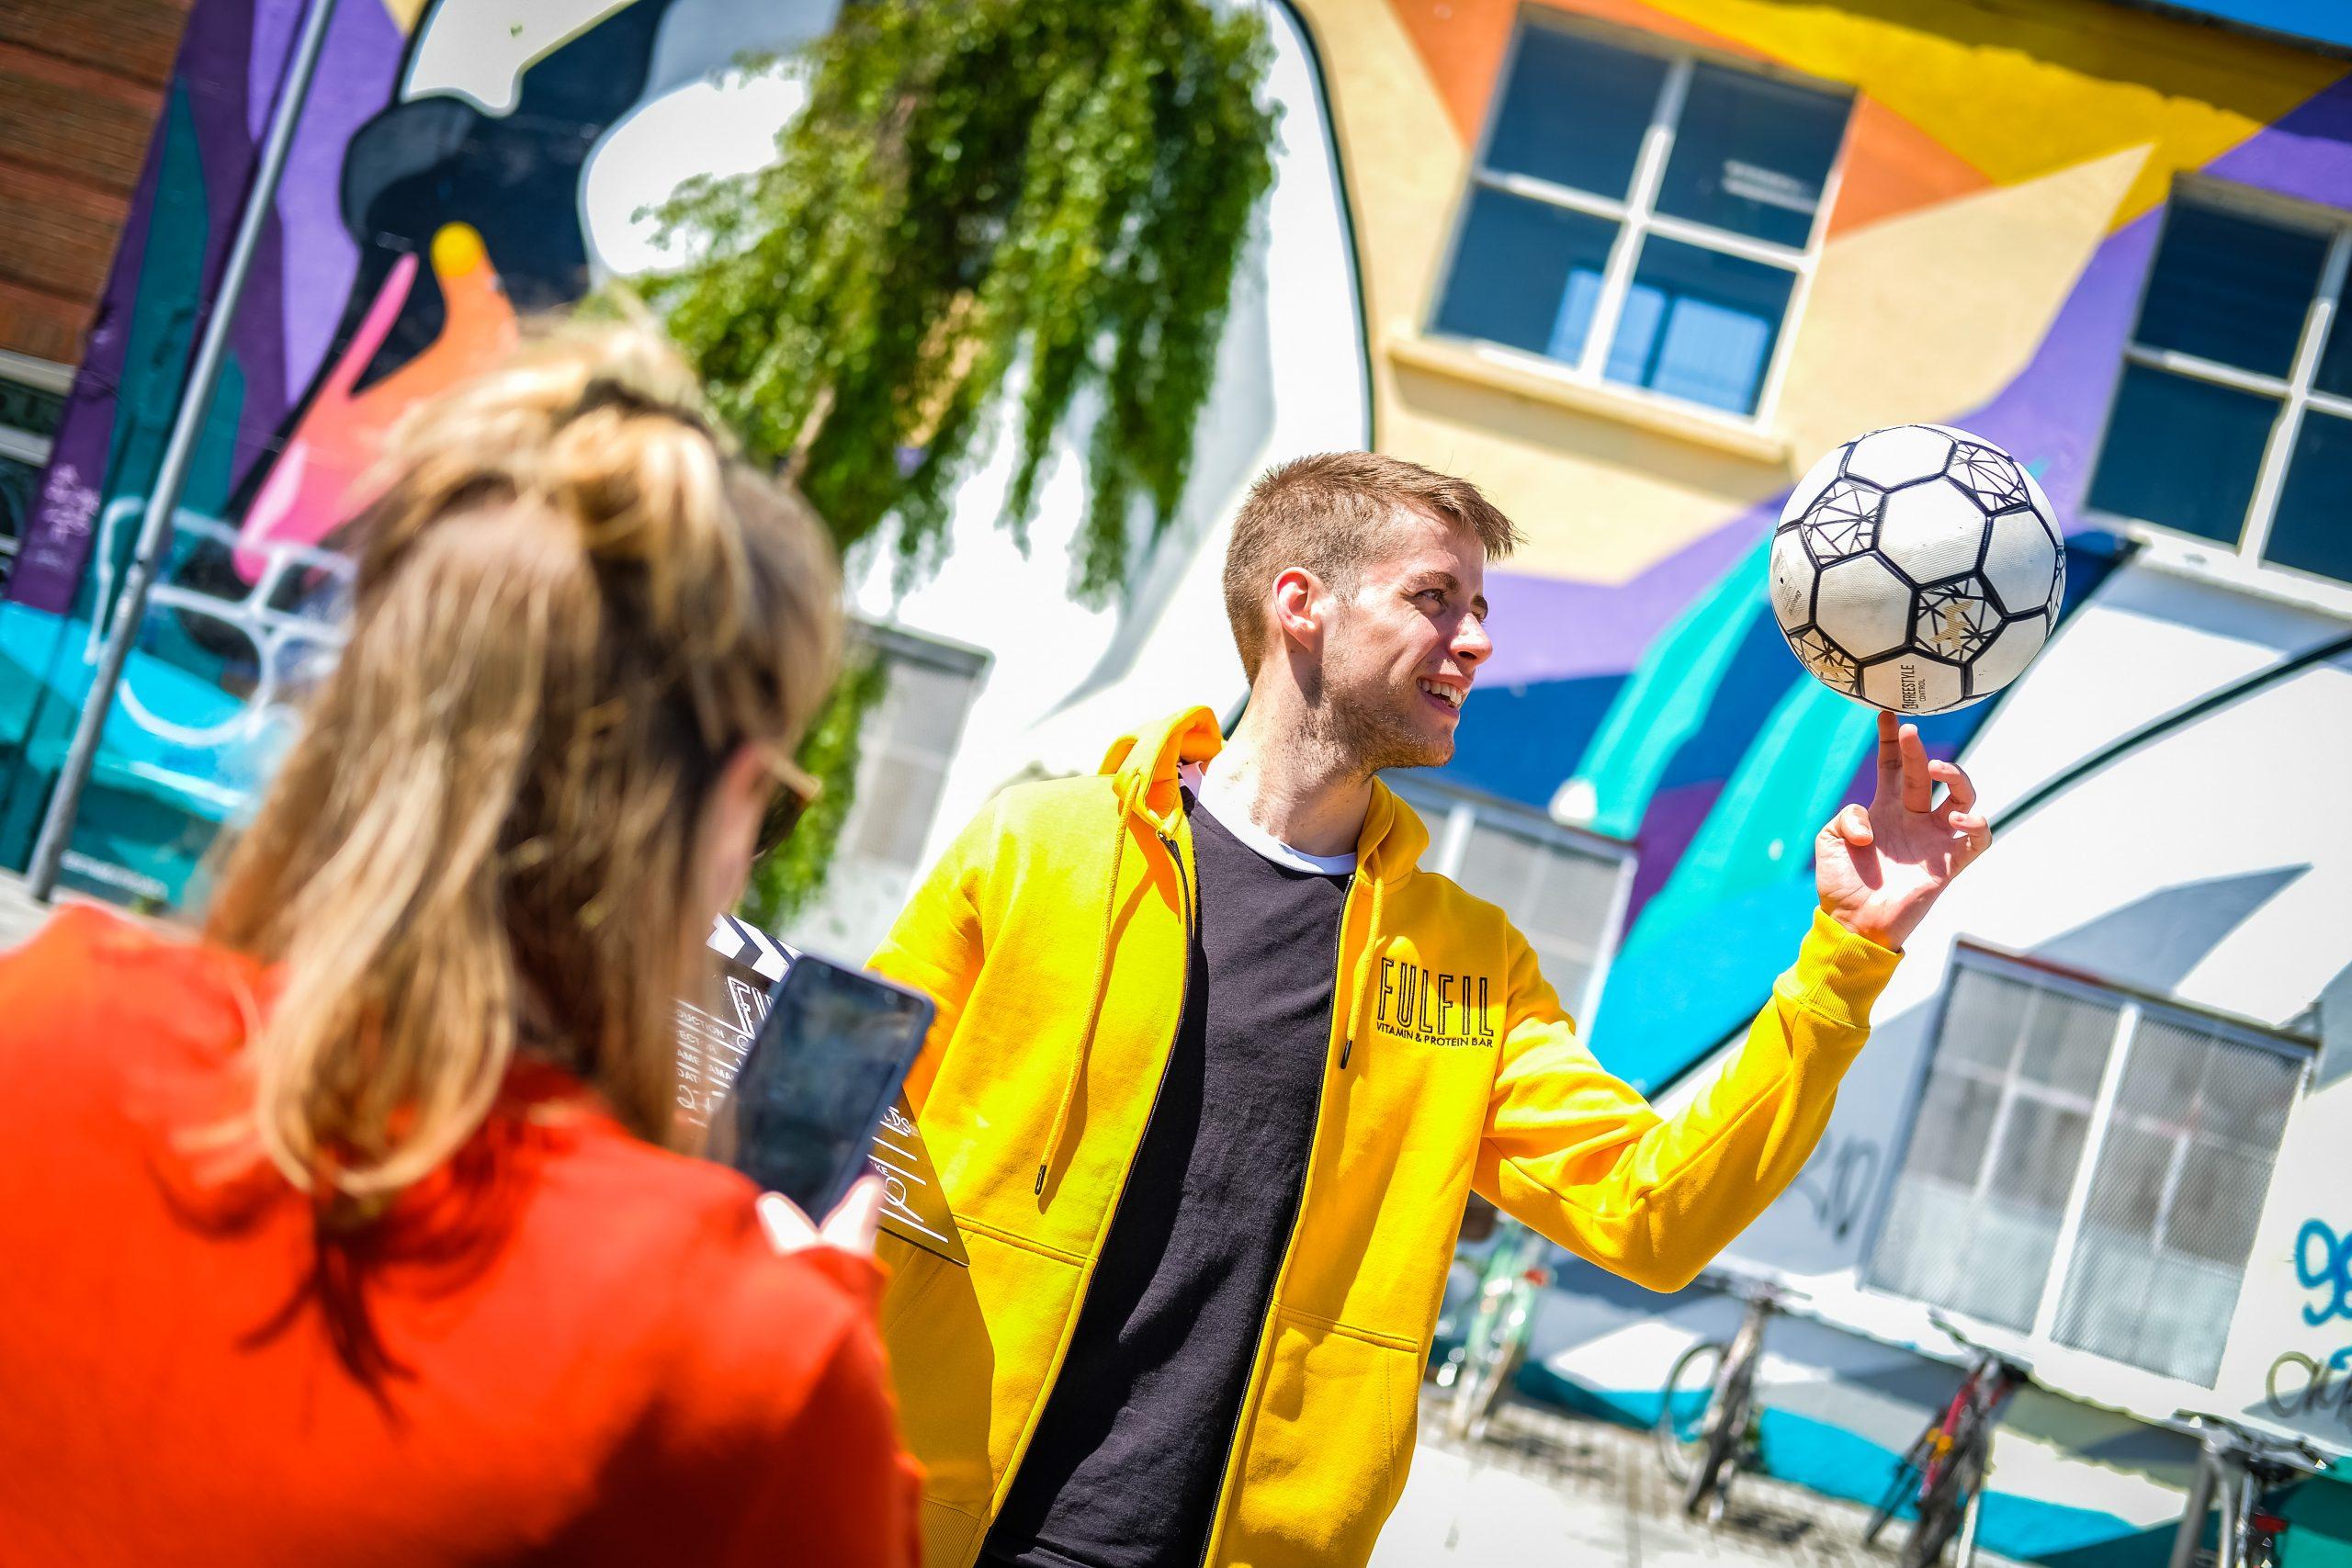 conor-reynold-fulfil-freestyle-football-dublin-fiona-madden